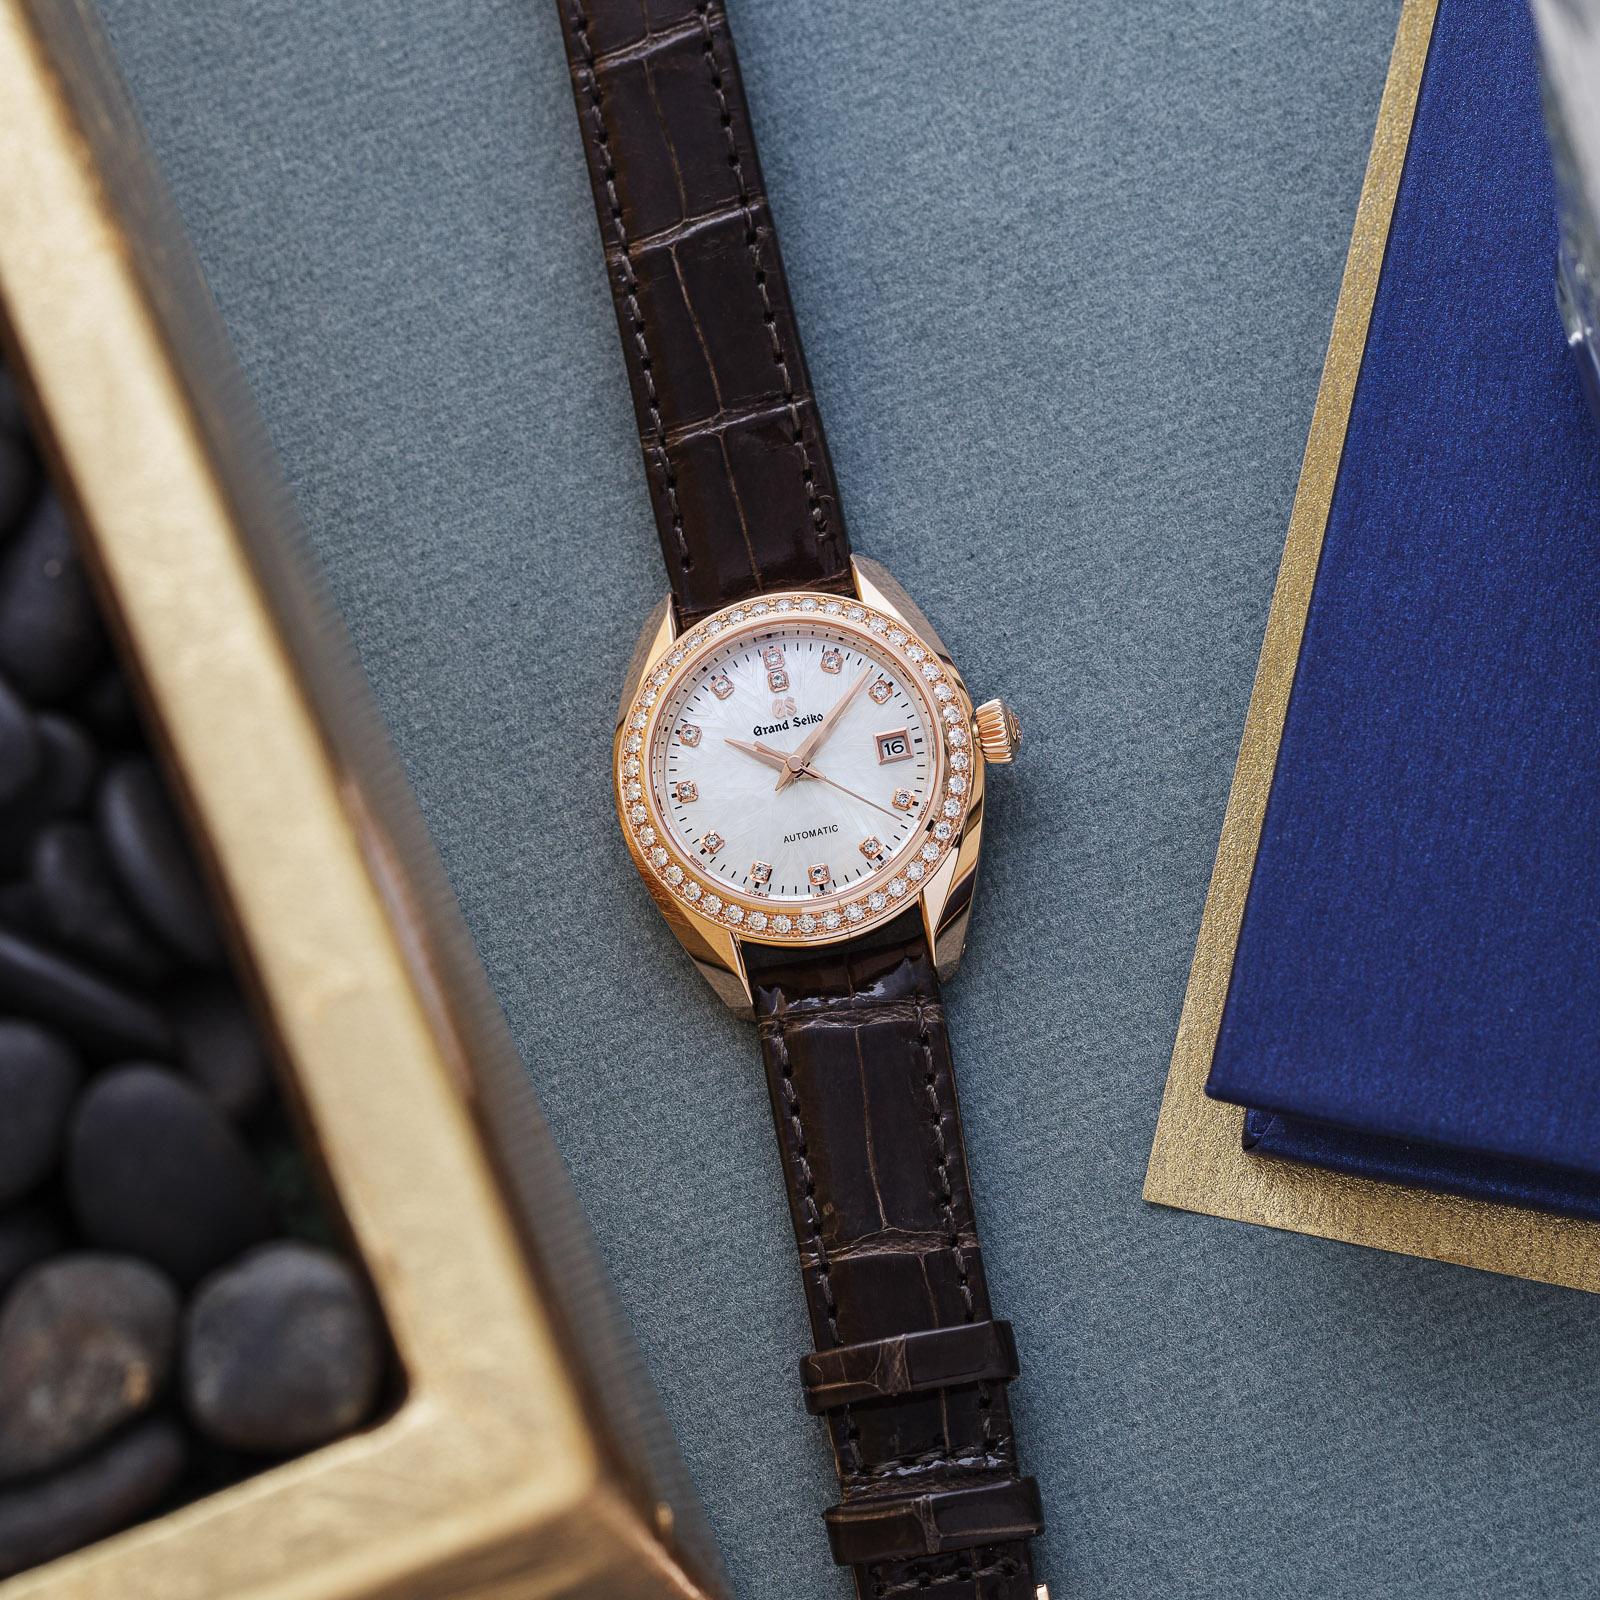 Grand Seiko wristwatch STGK006 - white dial, gold case on a brown strap atop a table.